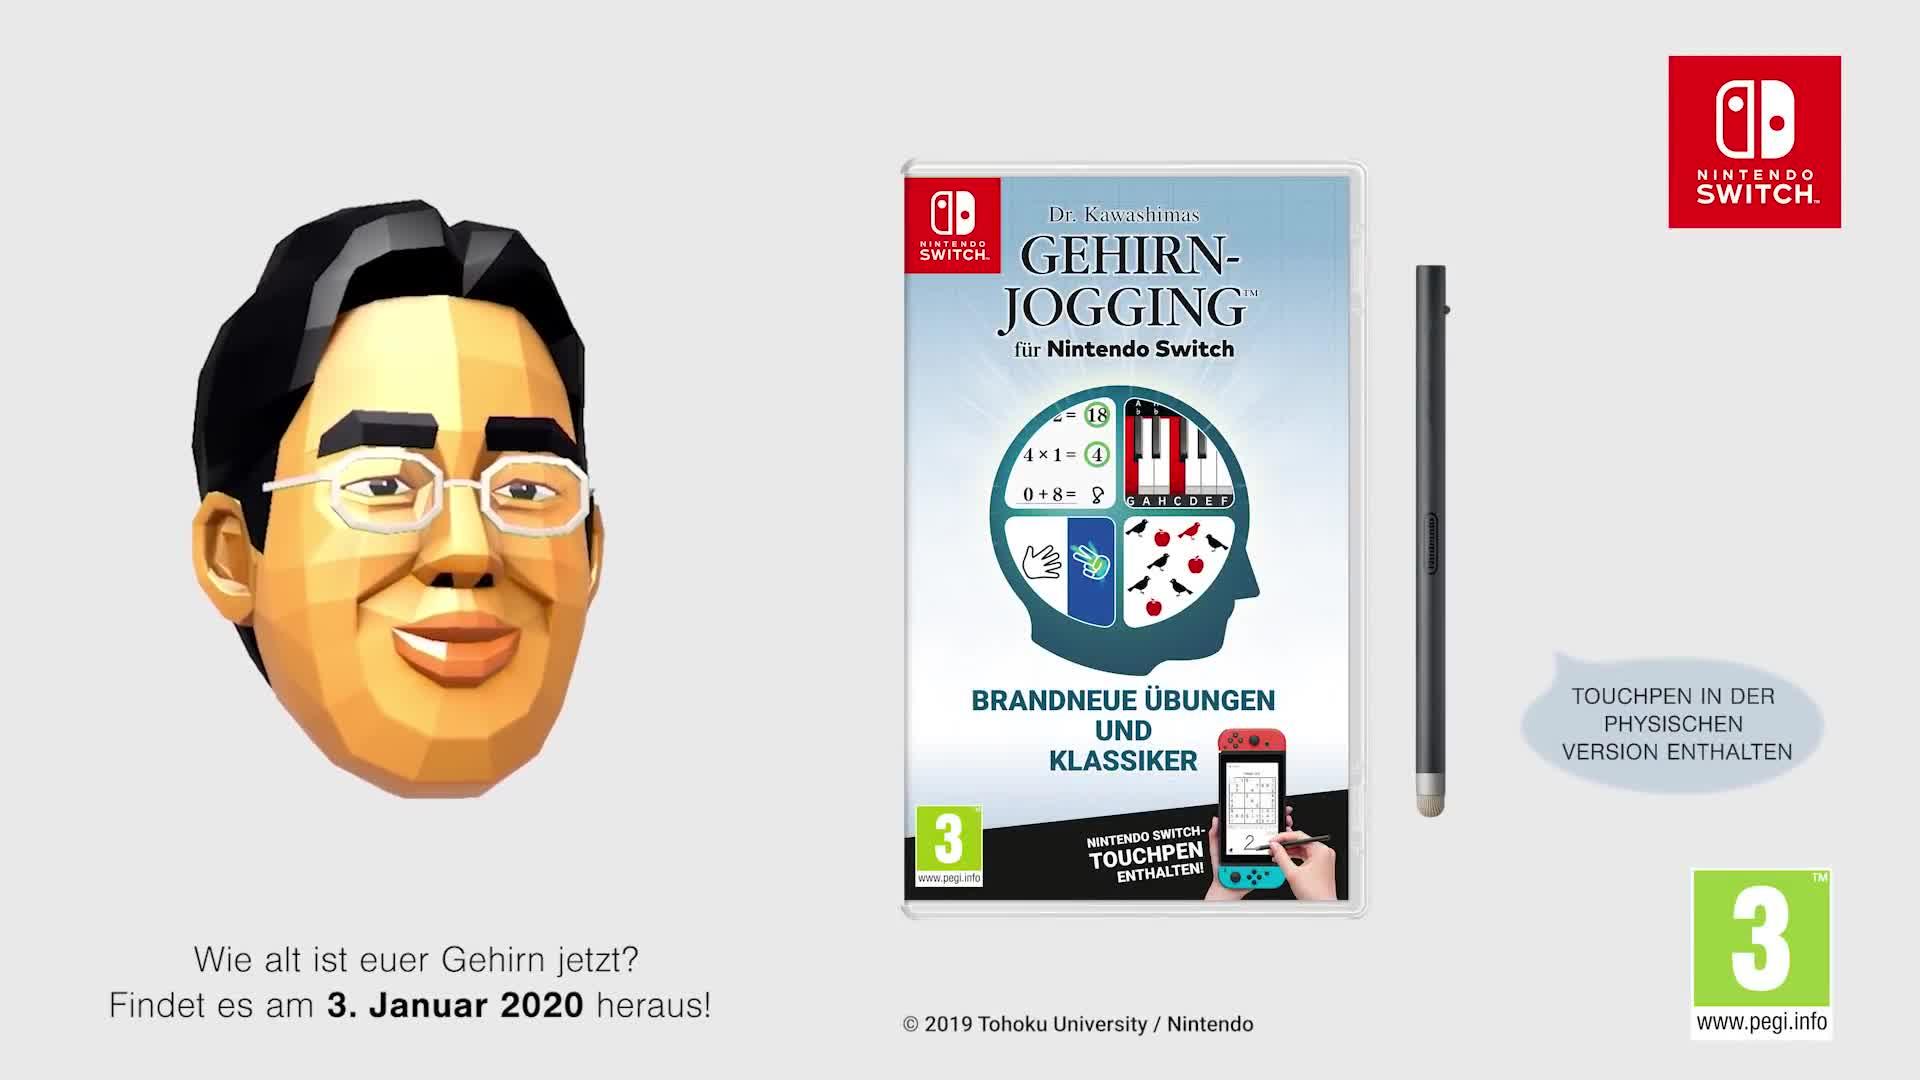 Trailer, Nintendo, Nintendo Switch, Switch, Dr. Kawashima, Dr. Kawashimas Gehirn-Jogging für Nintendo Switch, Dr. Kawashimas Gehirn-Jogging